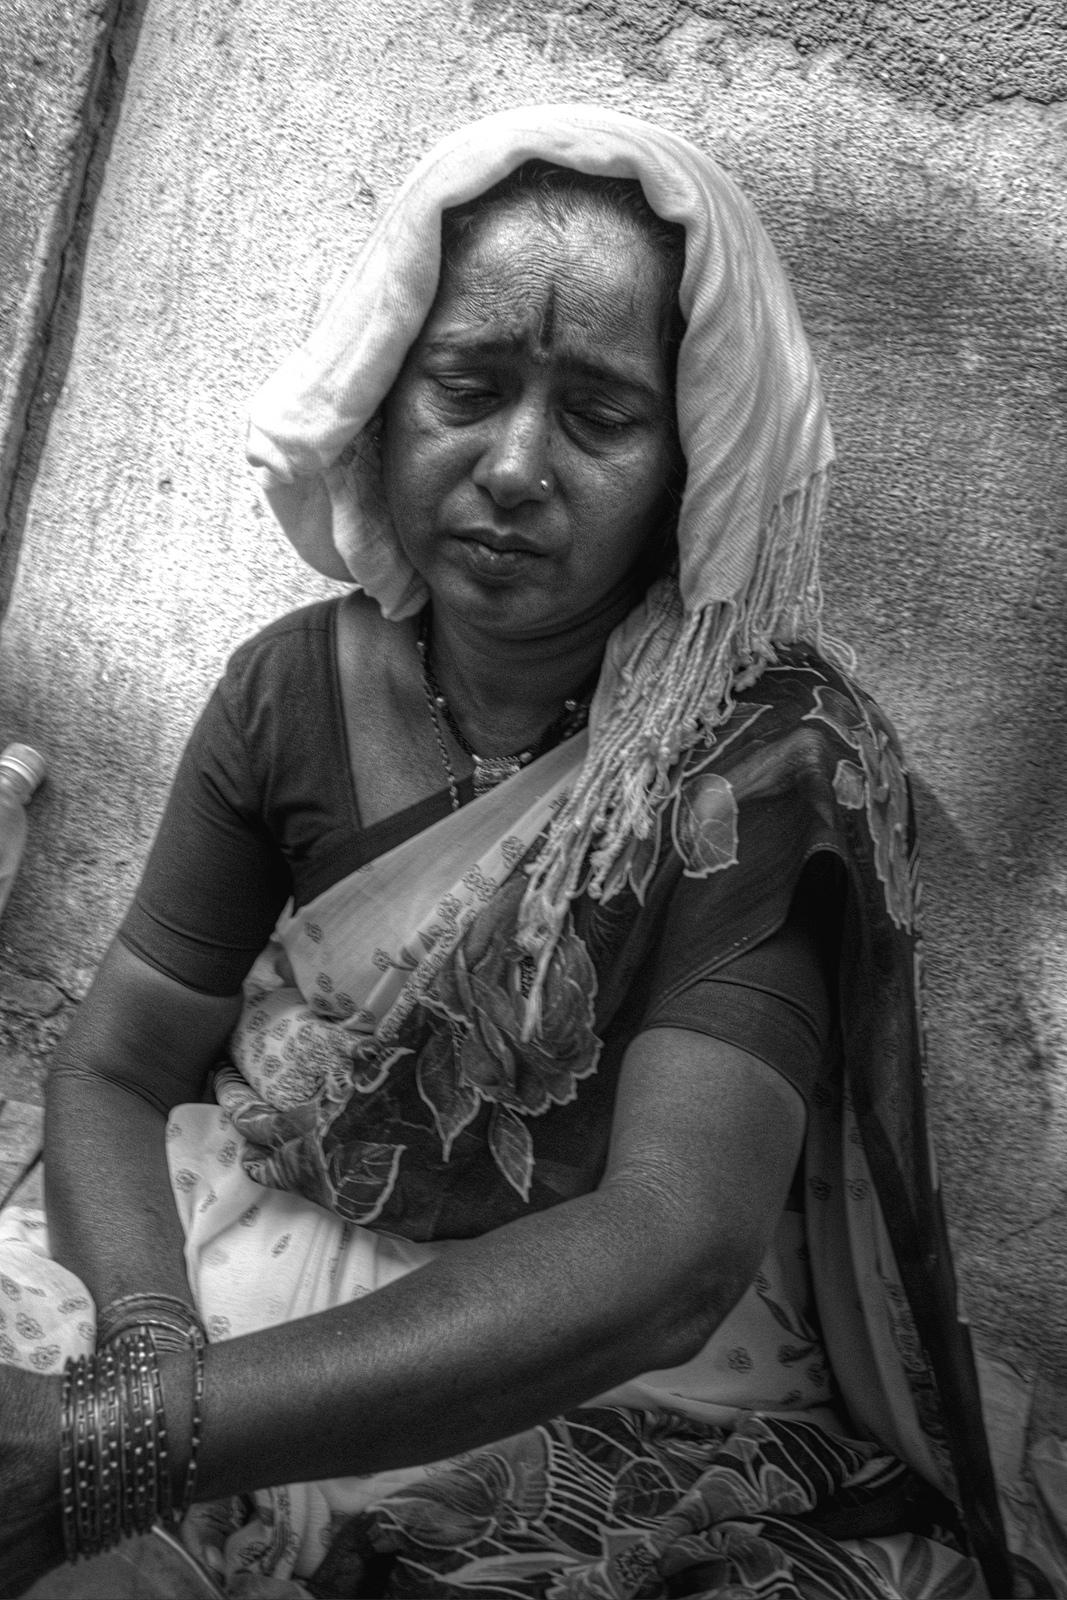 Sad woman in Mumbai, India